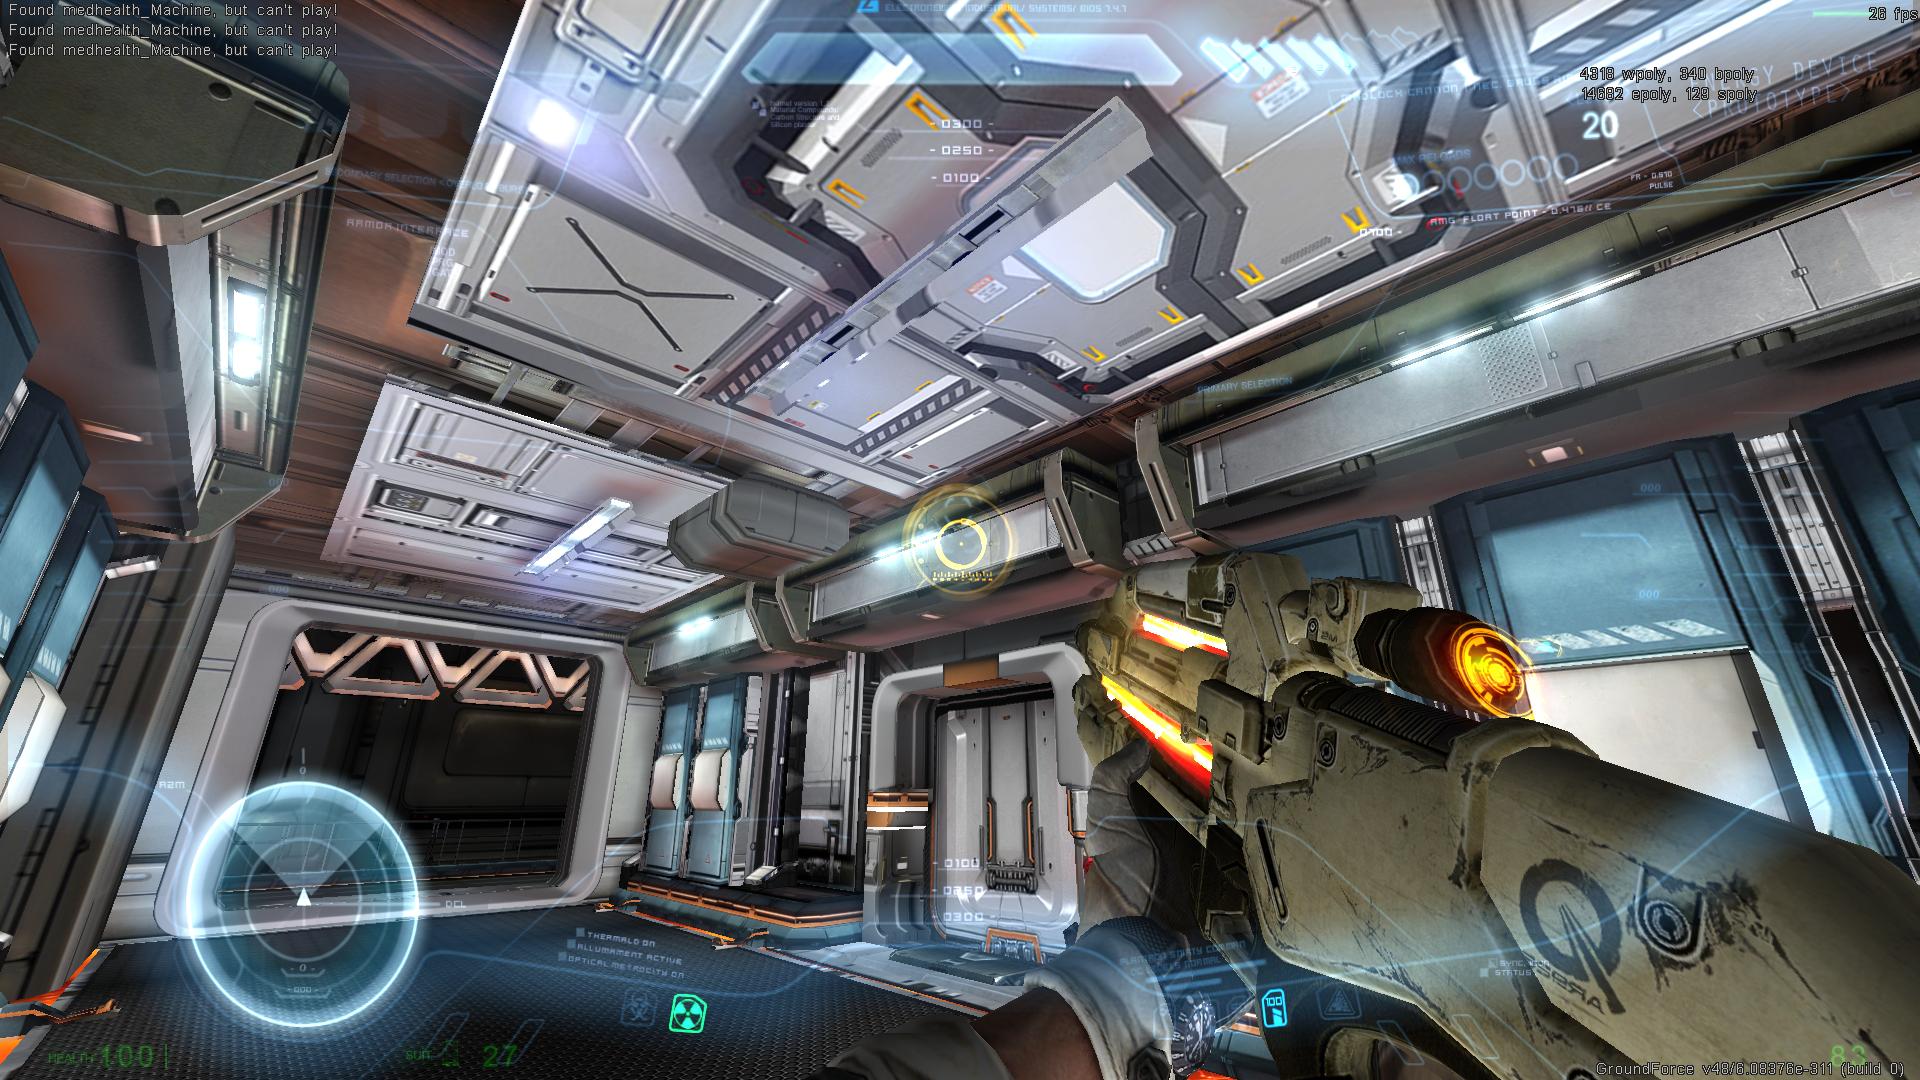 ew_teleportation_docking_0017